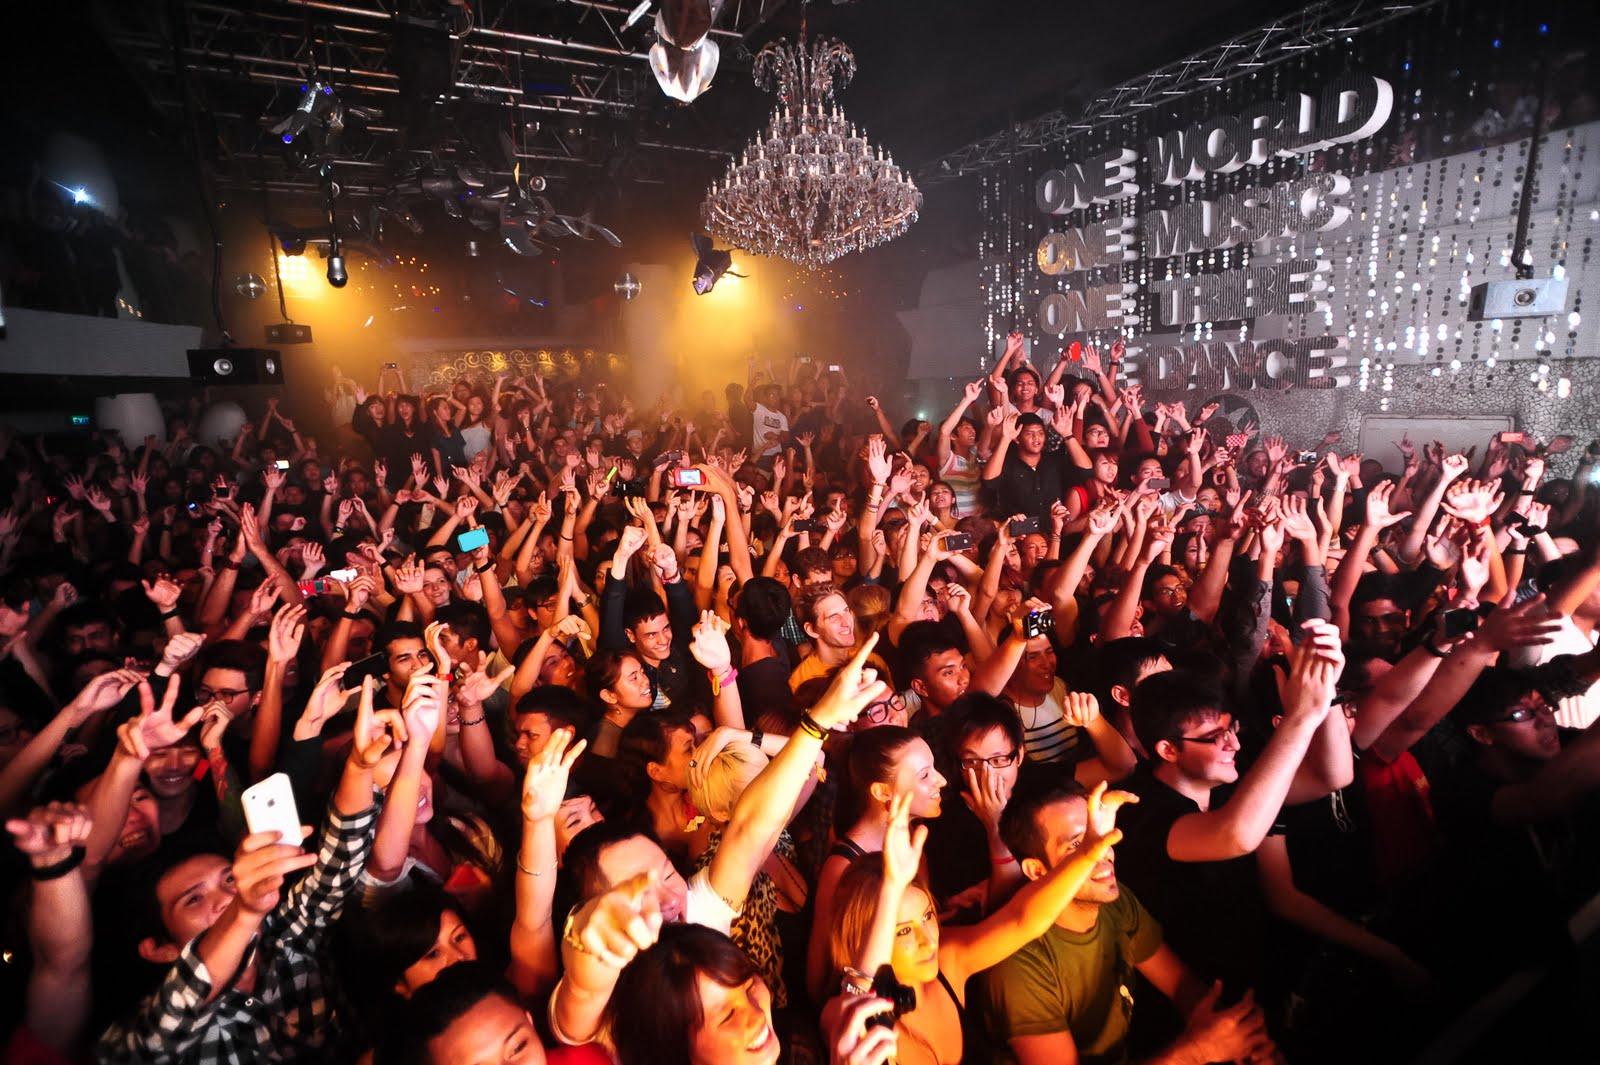 Фото ночного клуба Зоук в Сингапуре